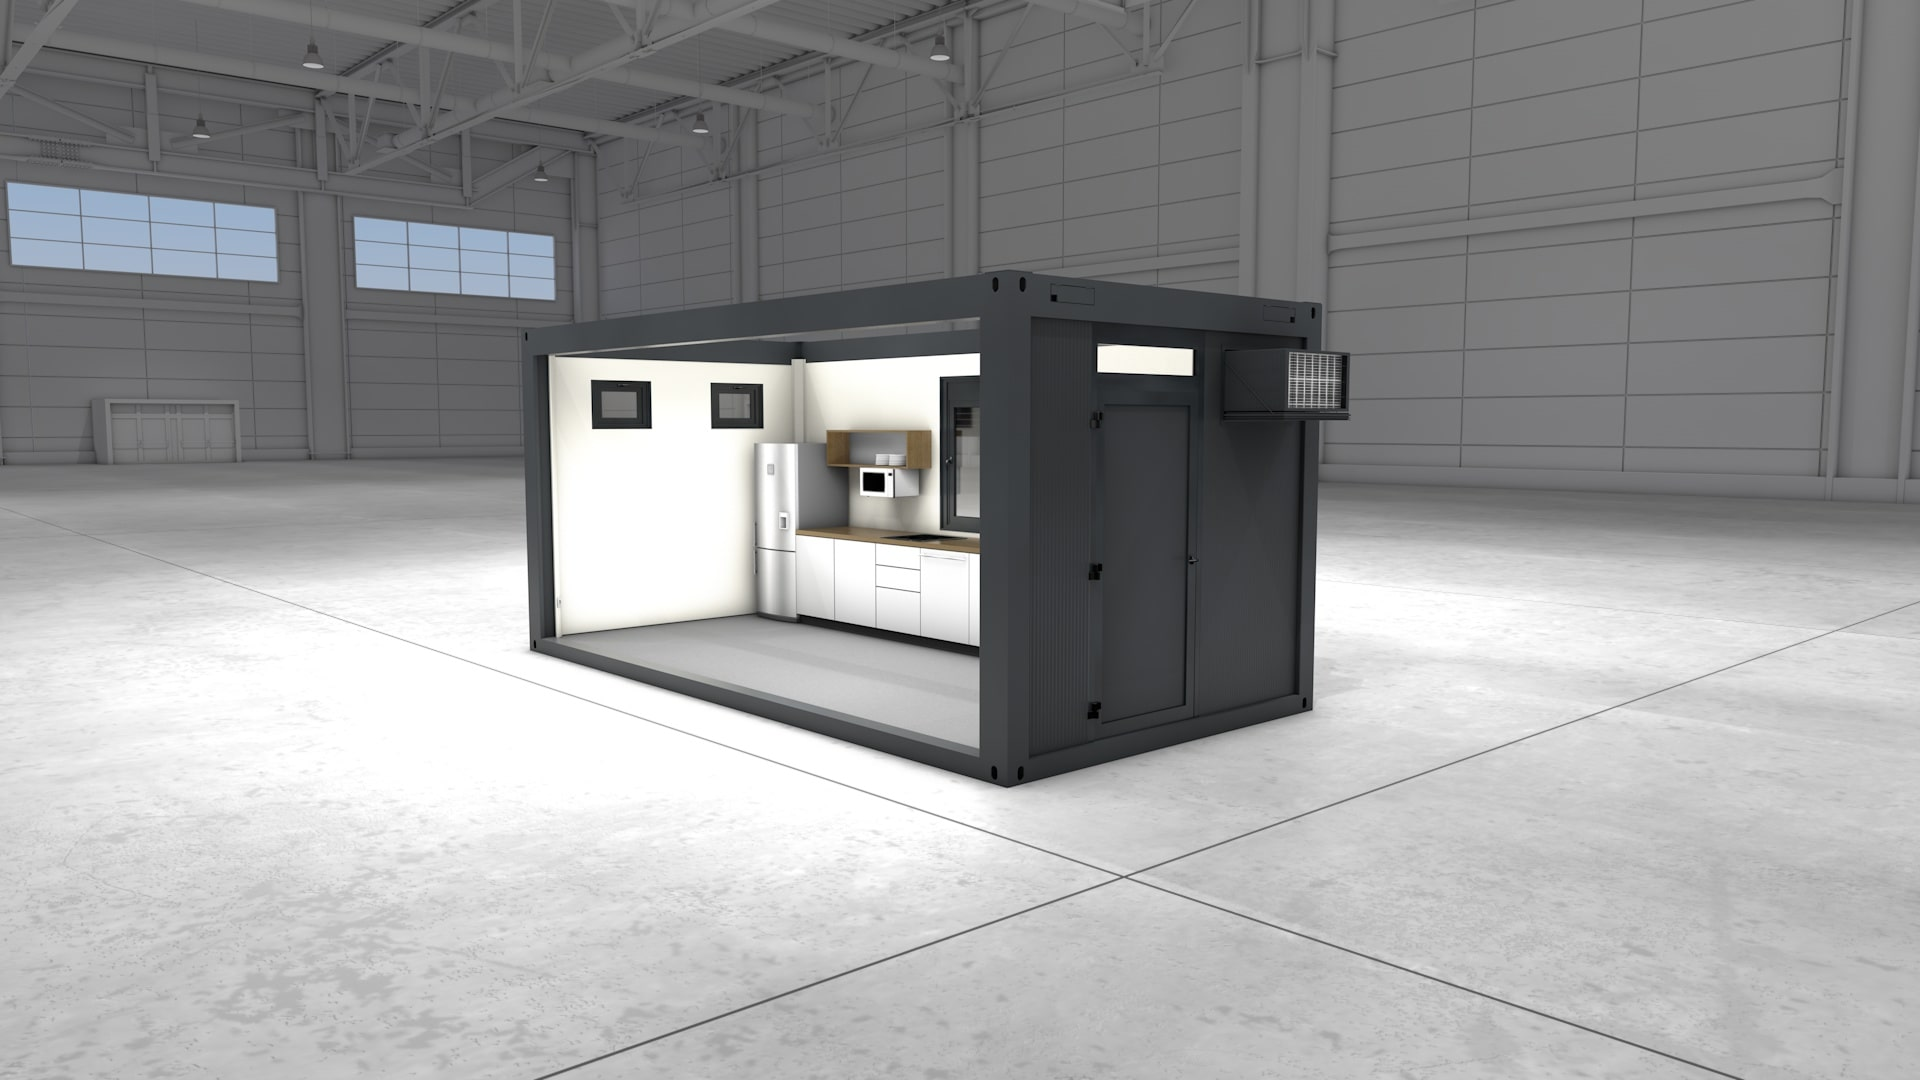 Container Modul 16 - Ansicht 2